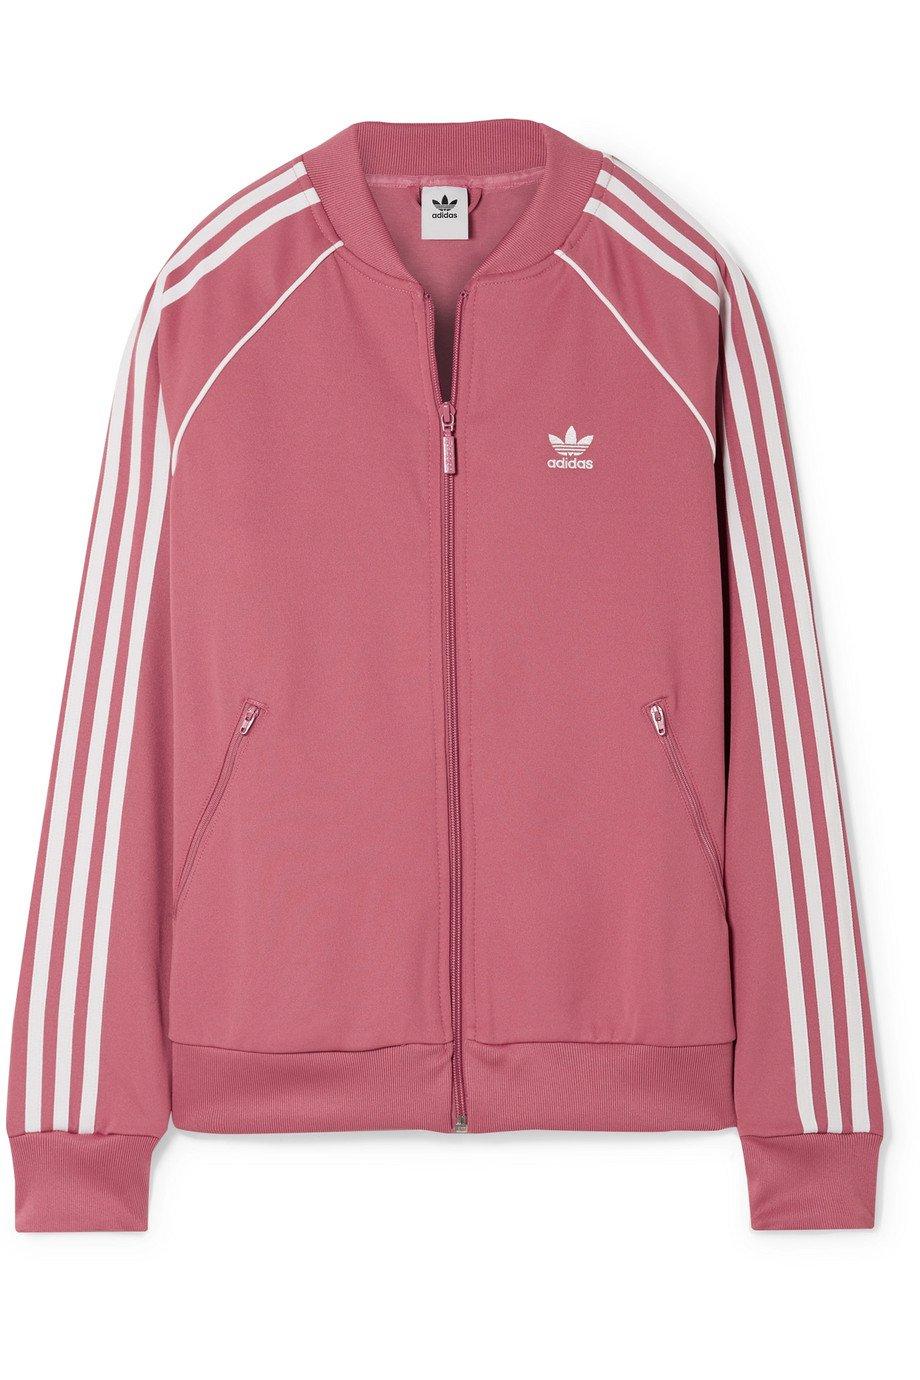 adidas Originals | SST Striped jersey track jacket | NET-A-PORTER.COM